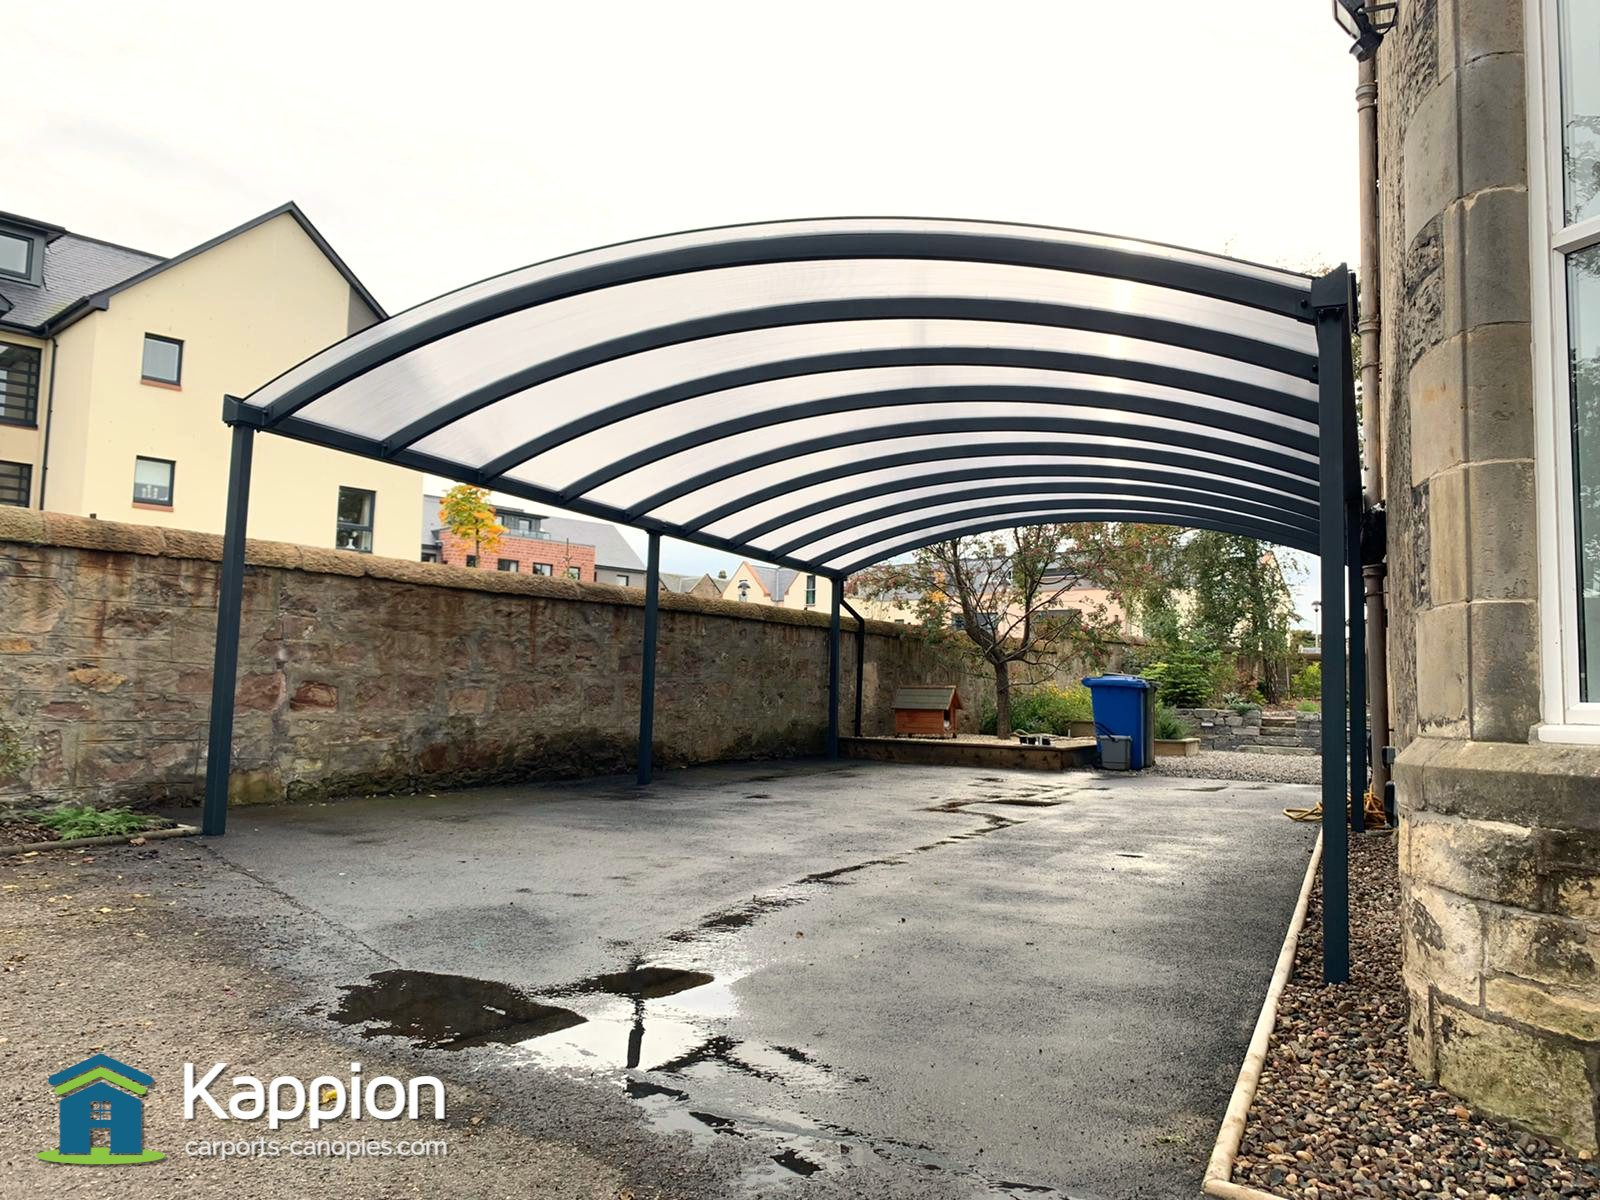 Wendy-Knoops-Carport-Canopy-003